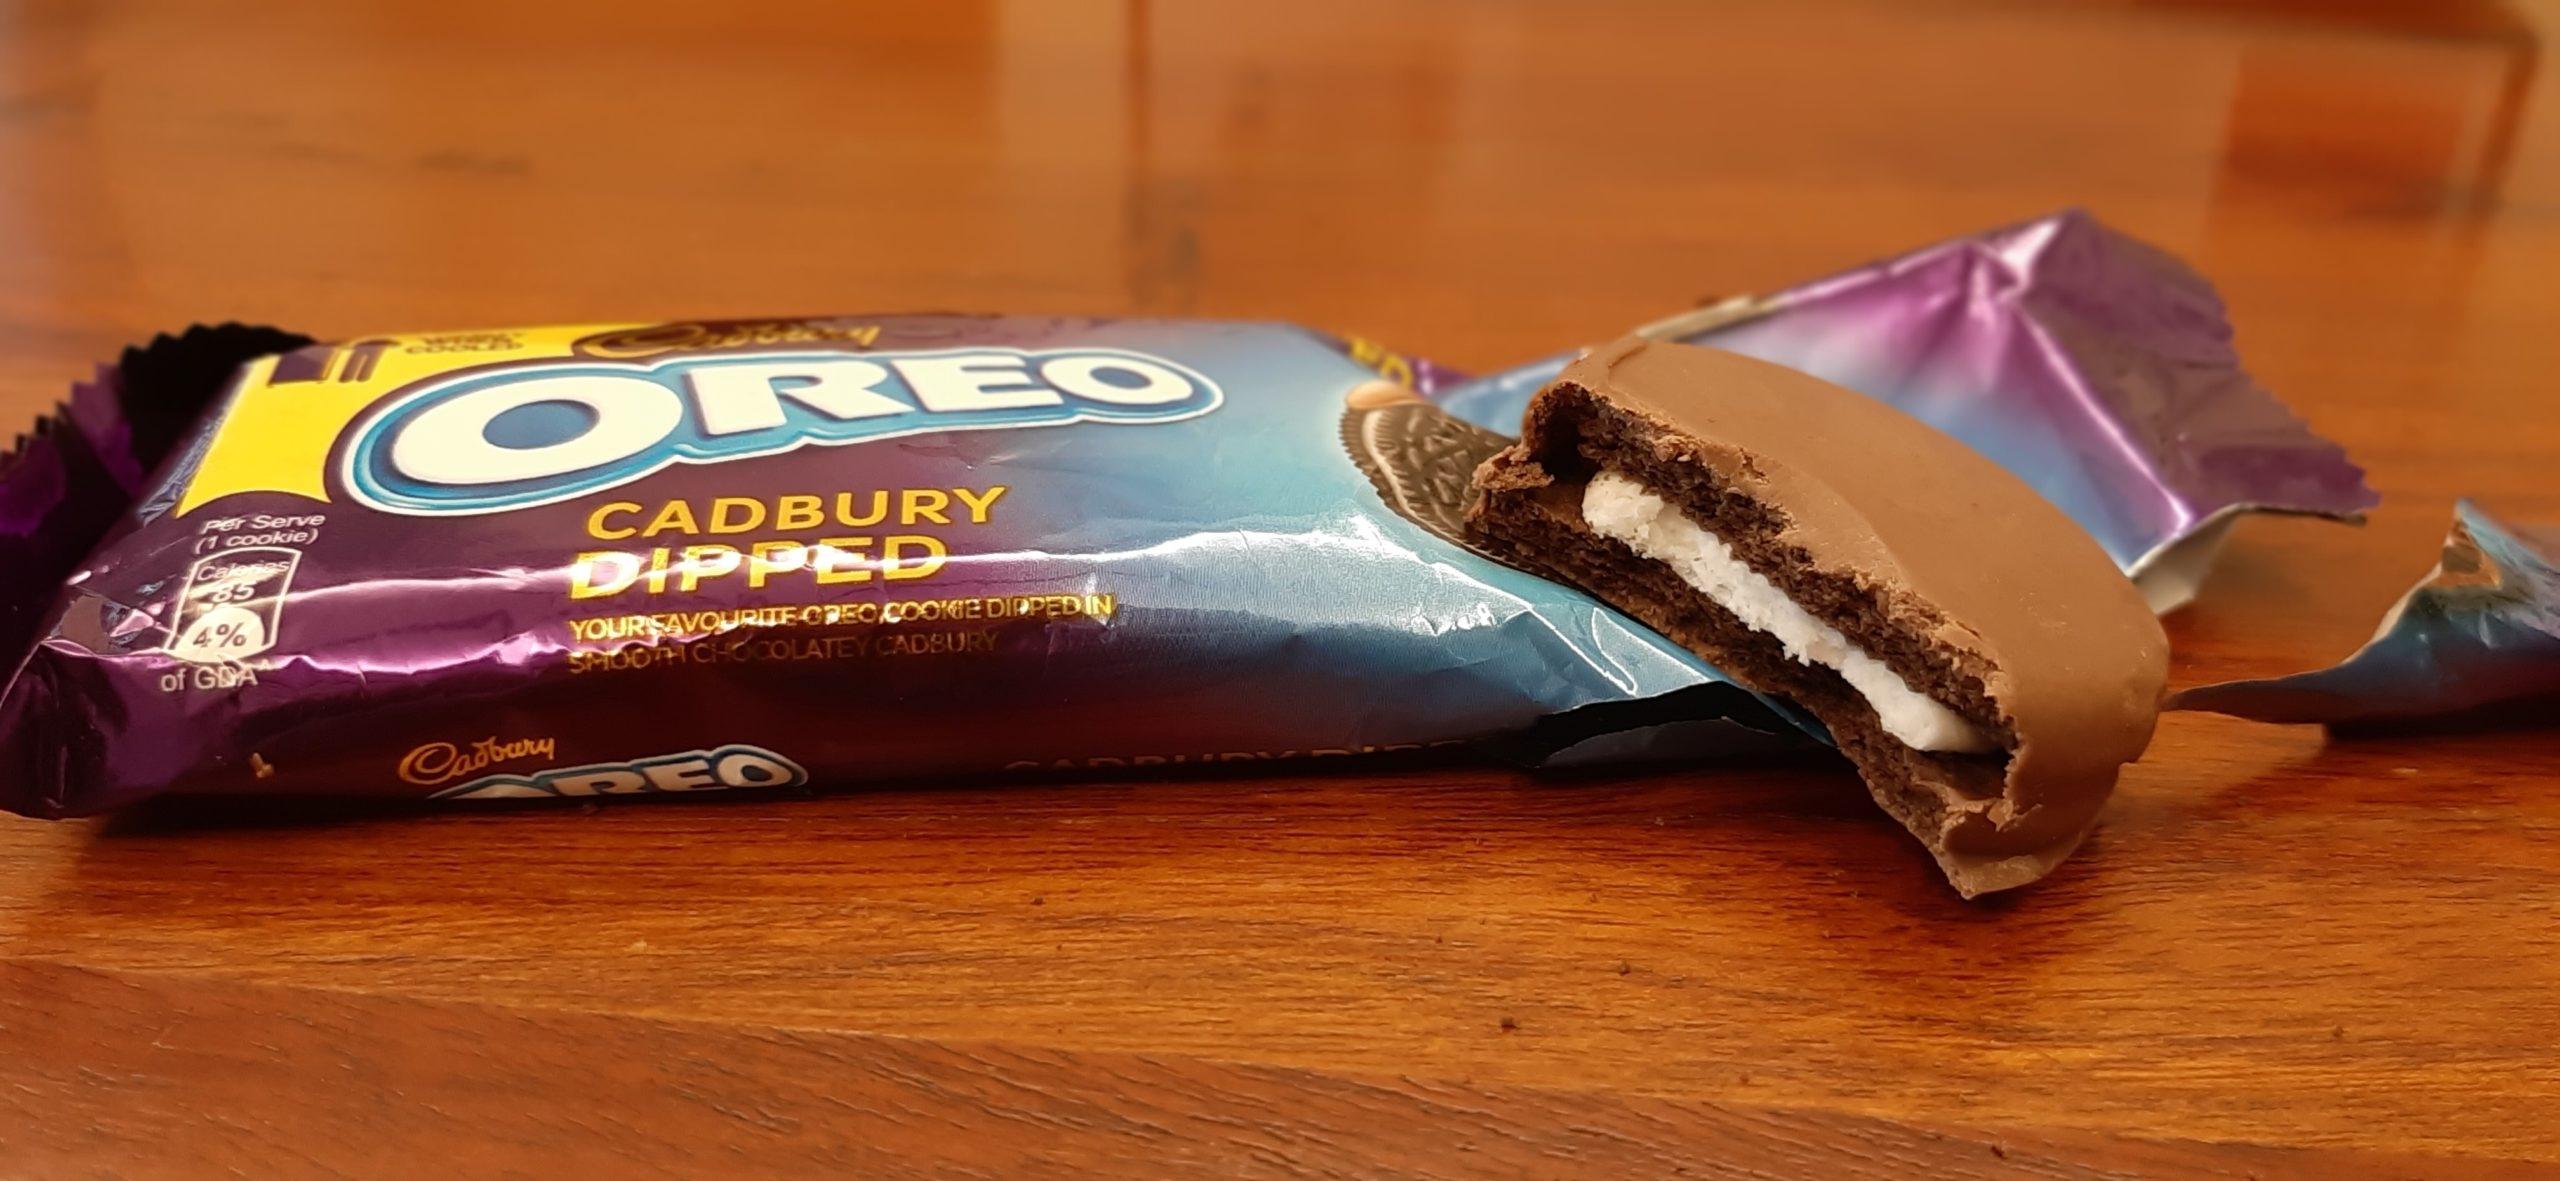 Cadbury Oreo Chocolate Dipped Cookies: #FirstImpressions